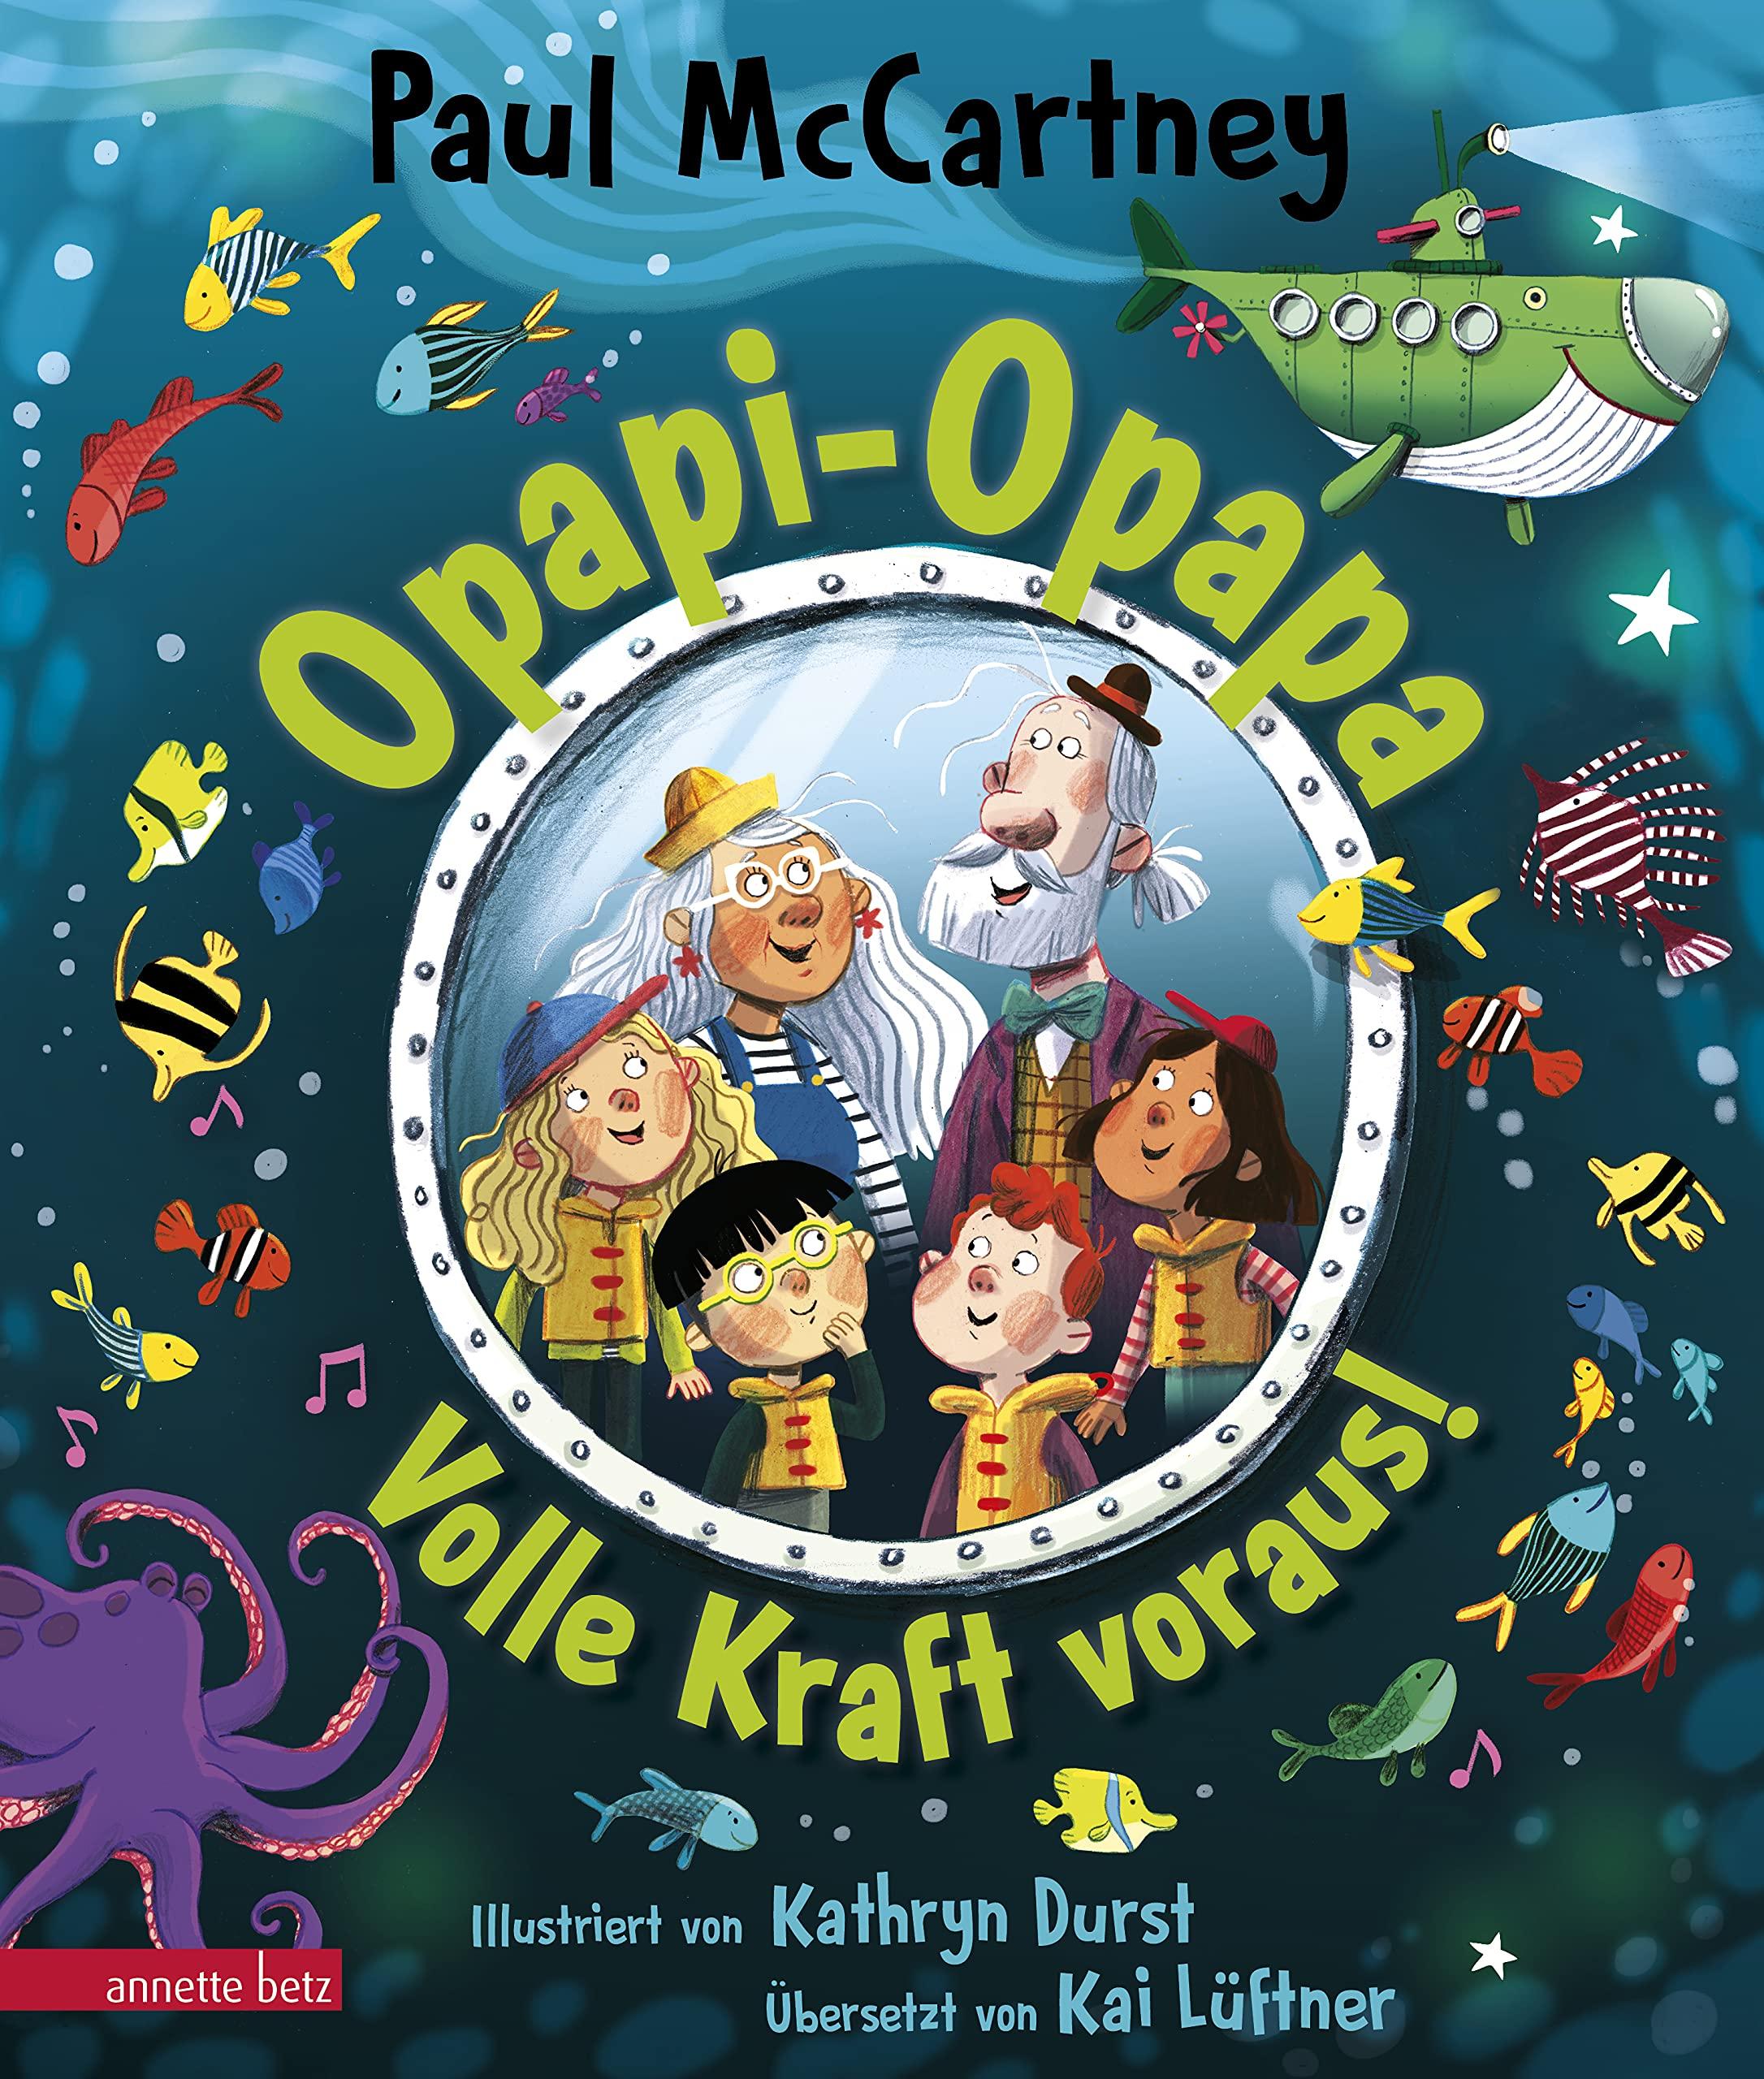 Opapi-Opapa – Volle Kraft voraus!